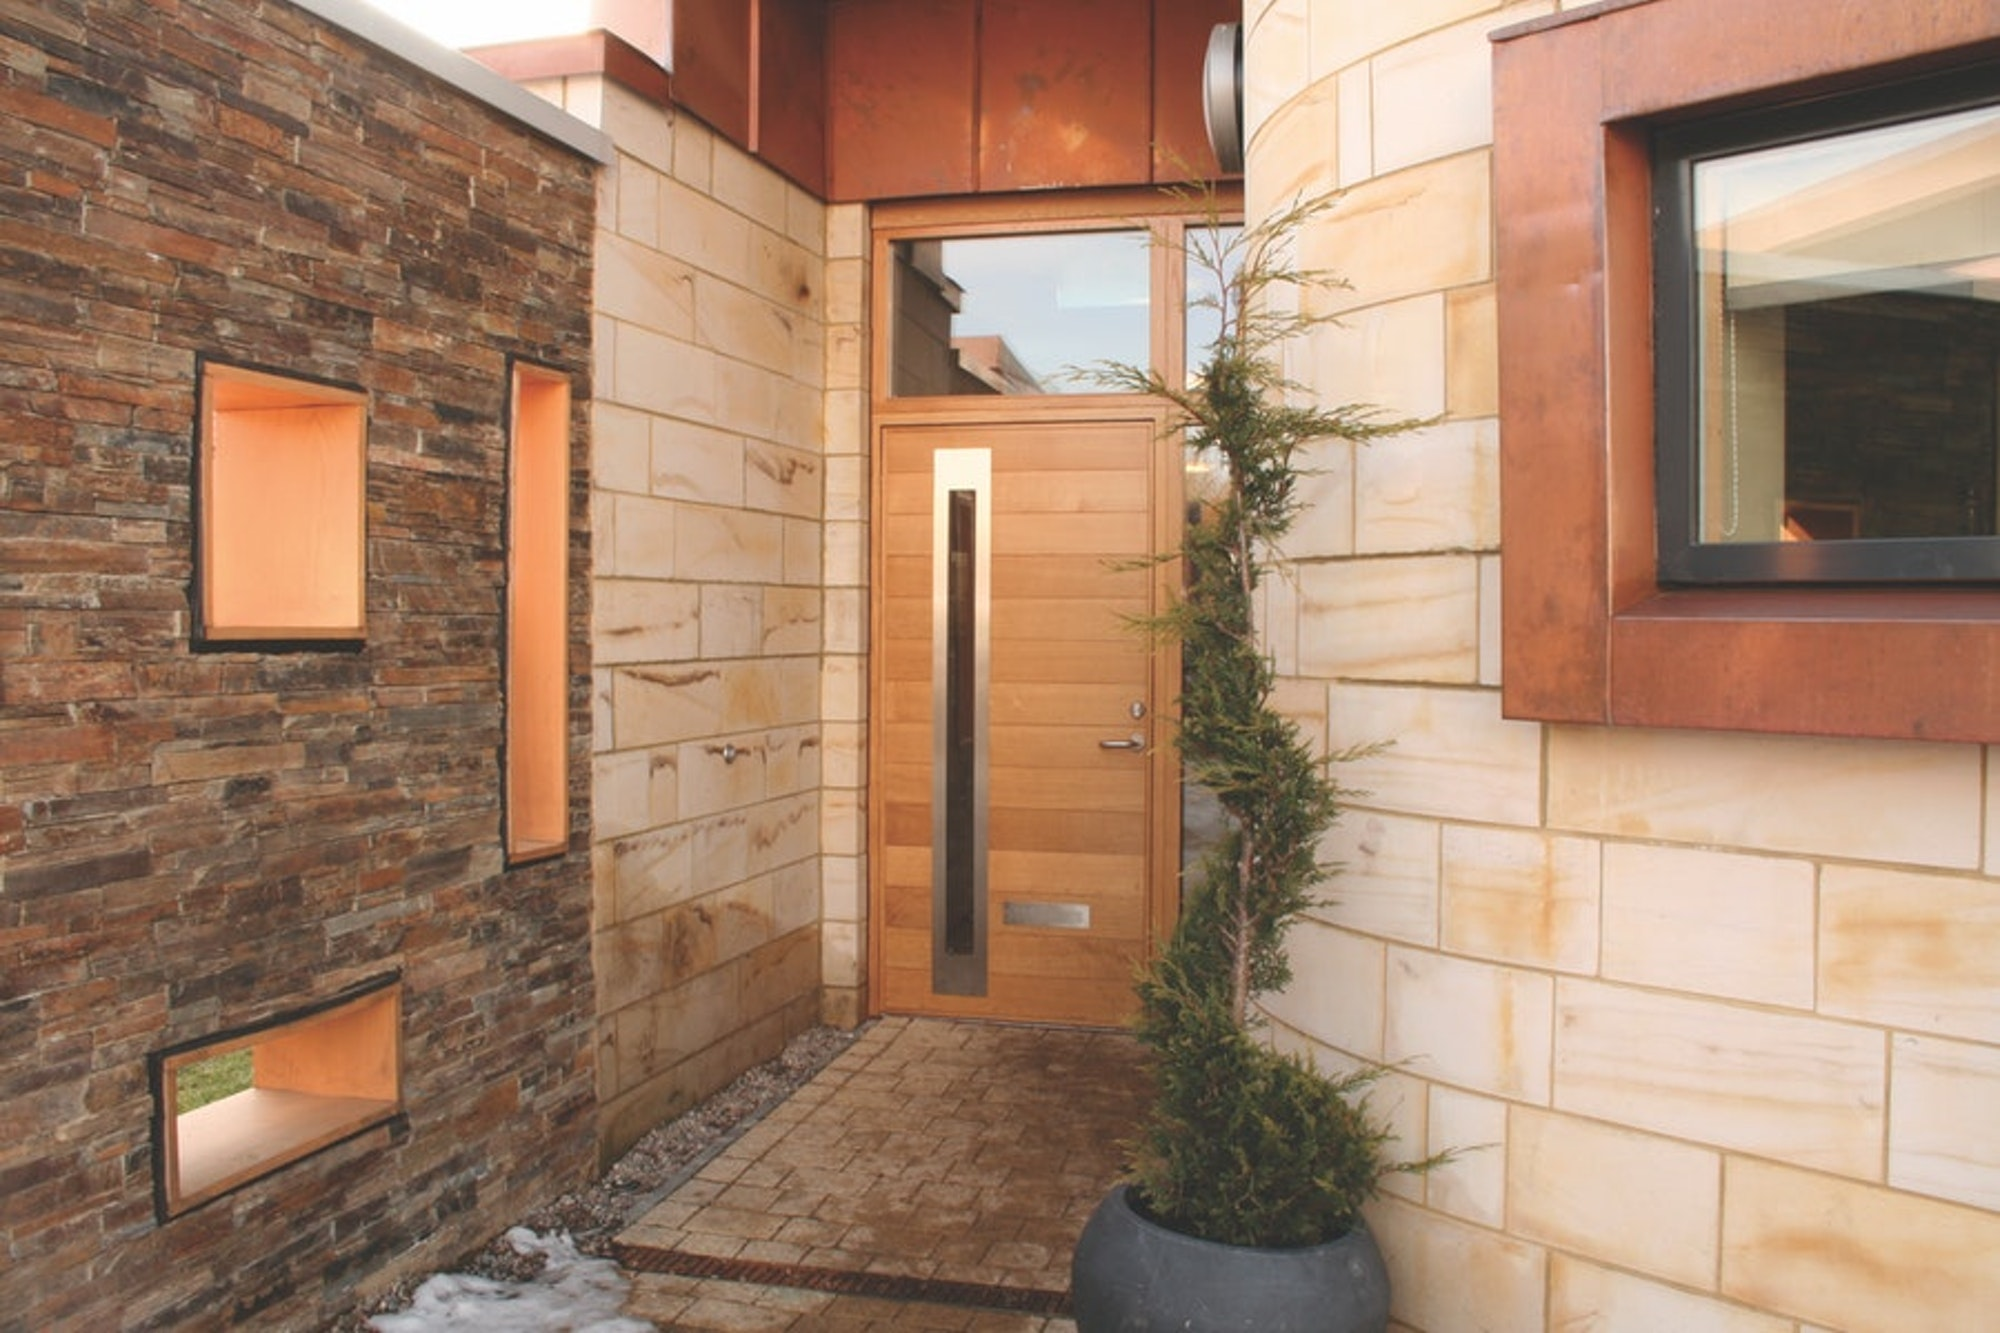 sorrento | Western Red Cedar | storeylite and side lite to match door